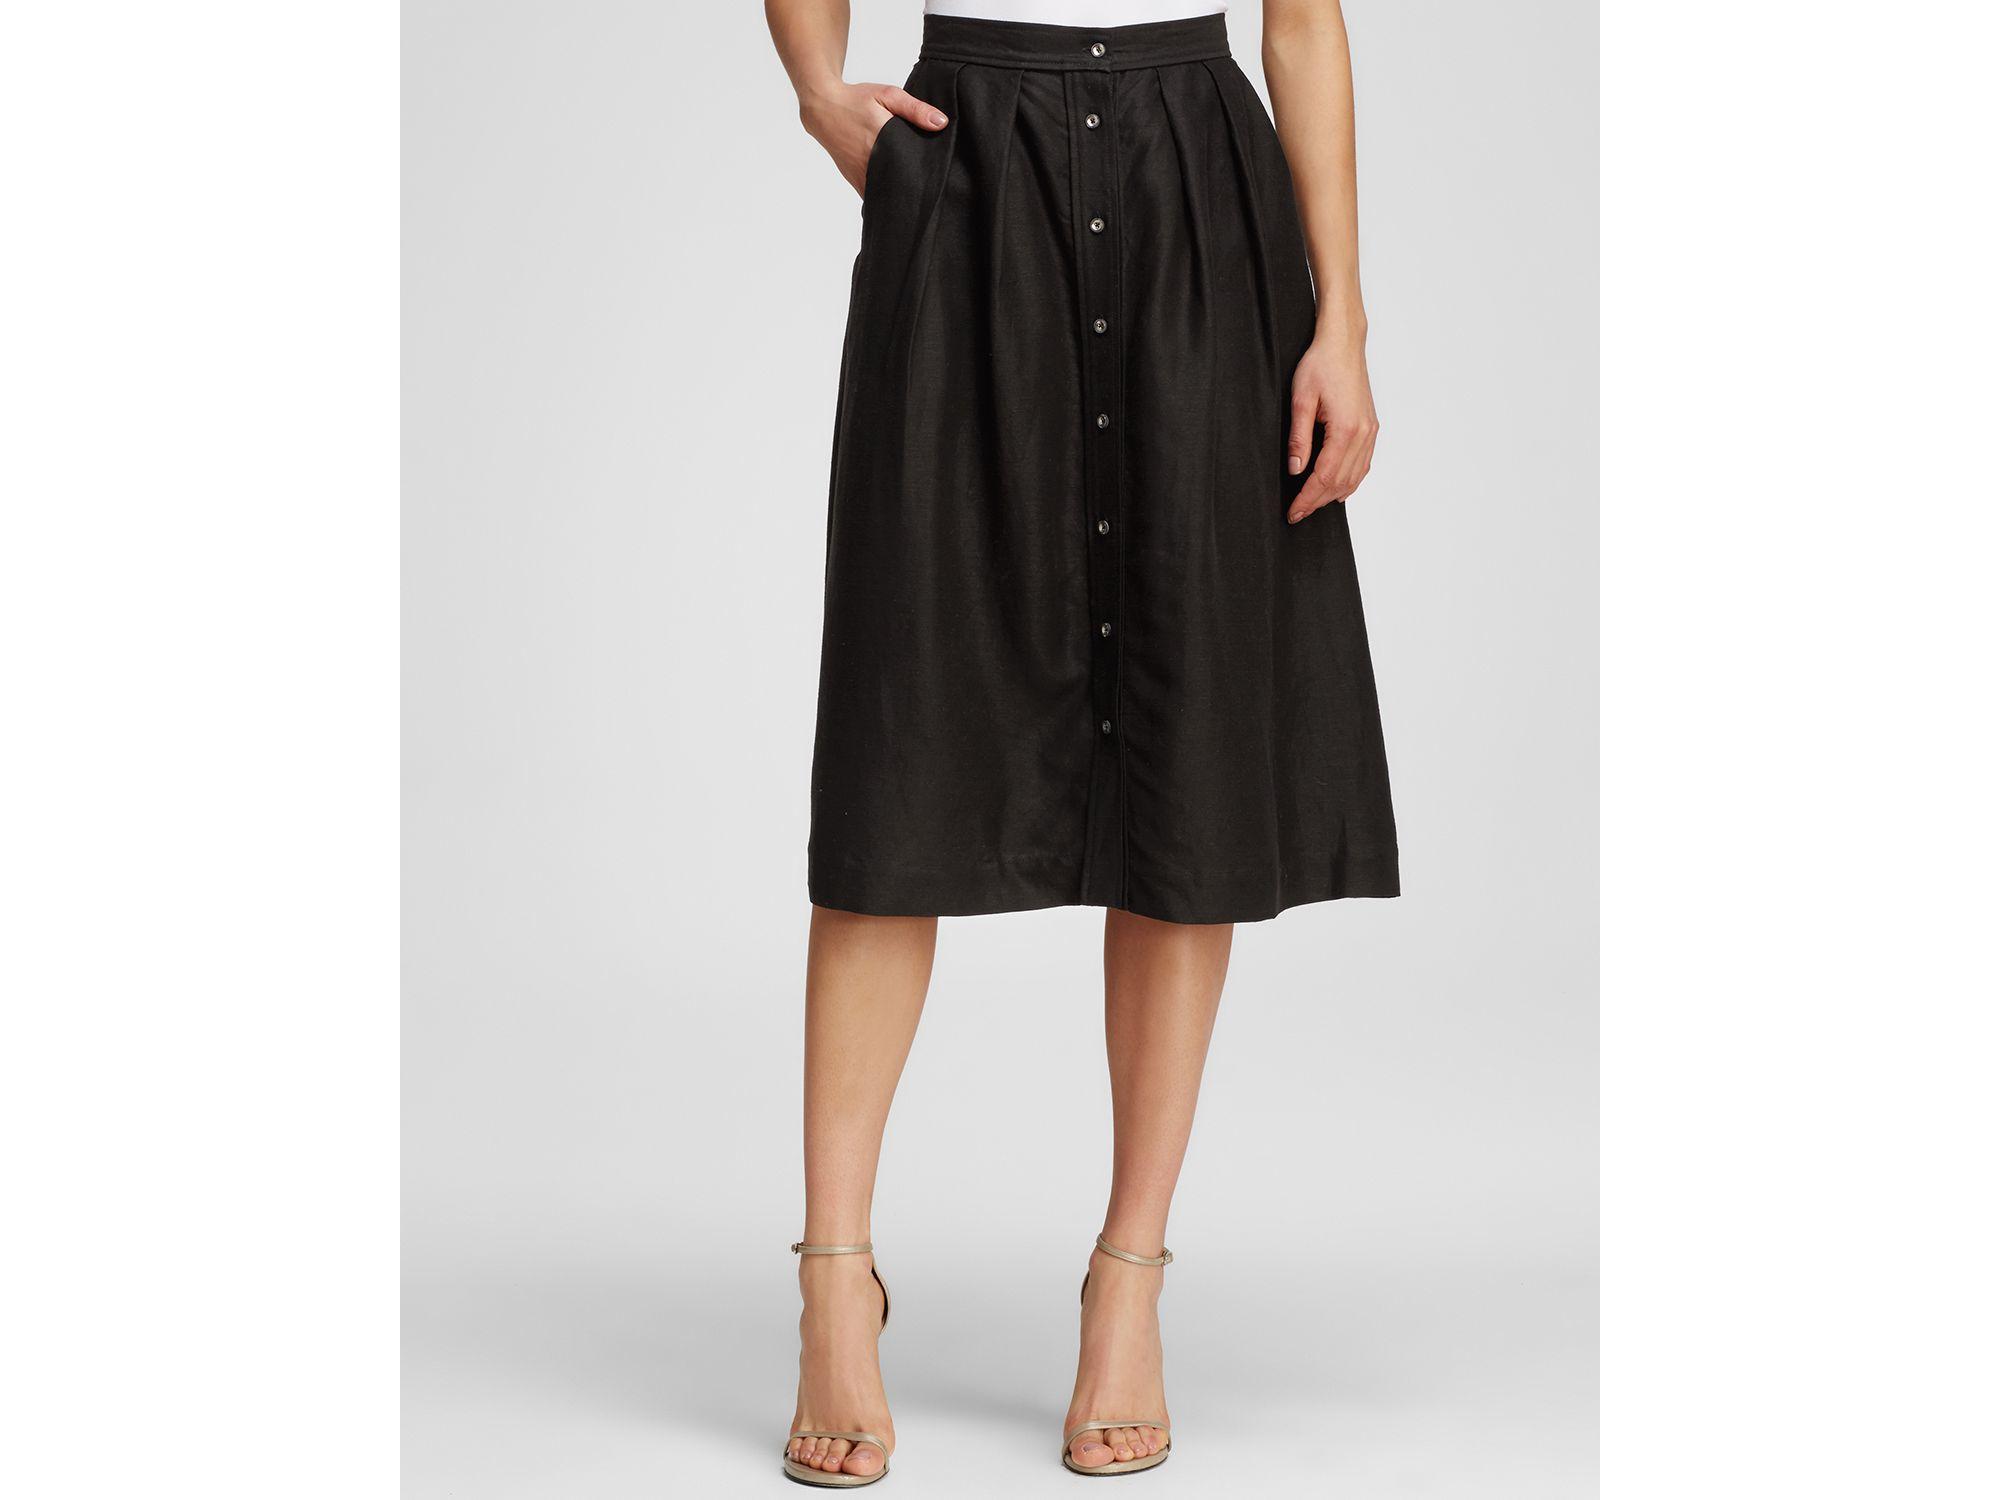 Milly Linen Button Down Midi Skirt in Black | Lyst